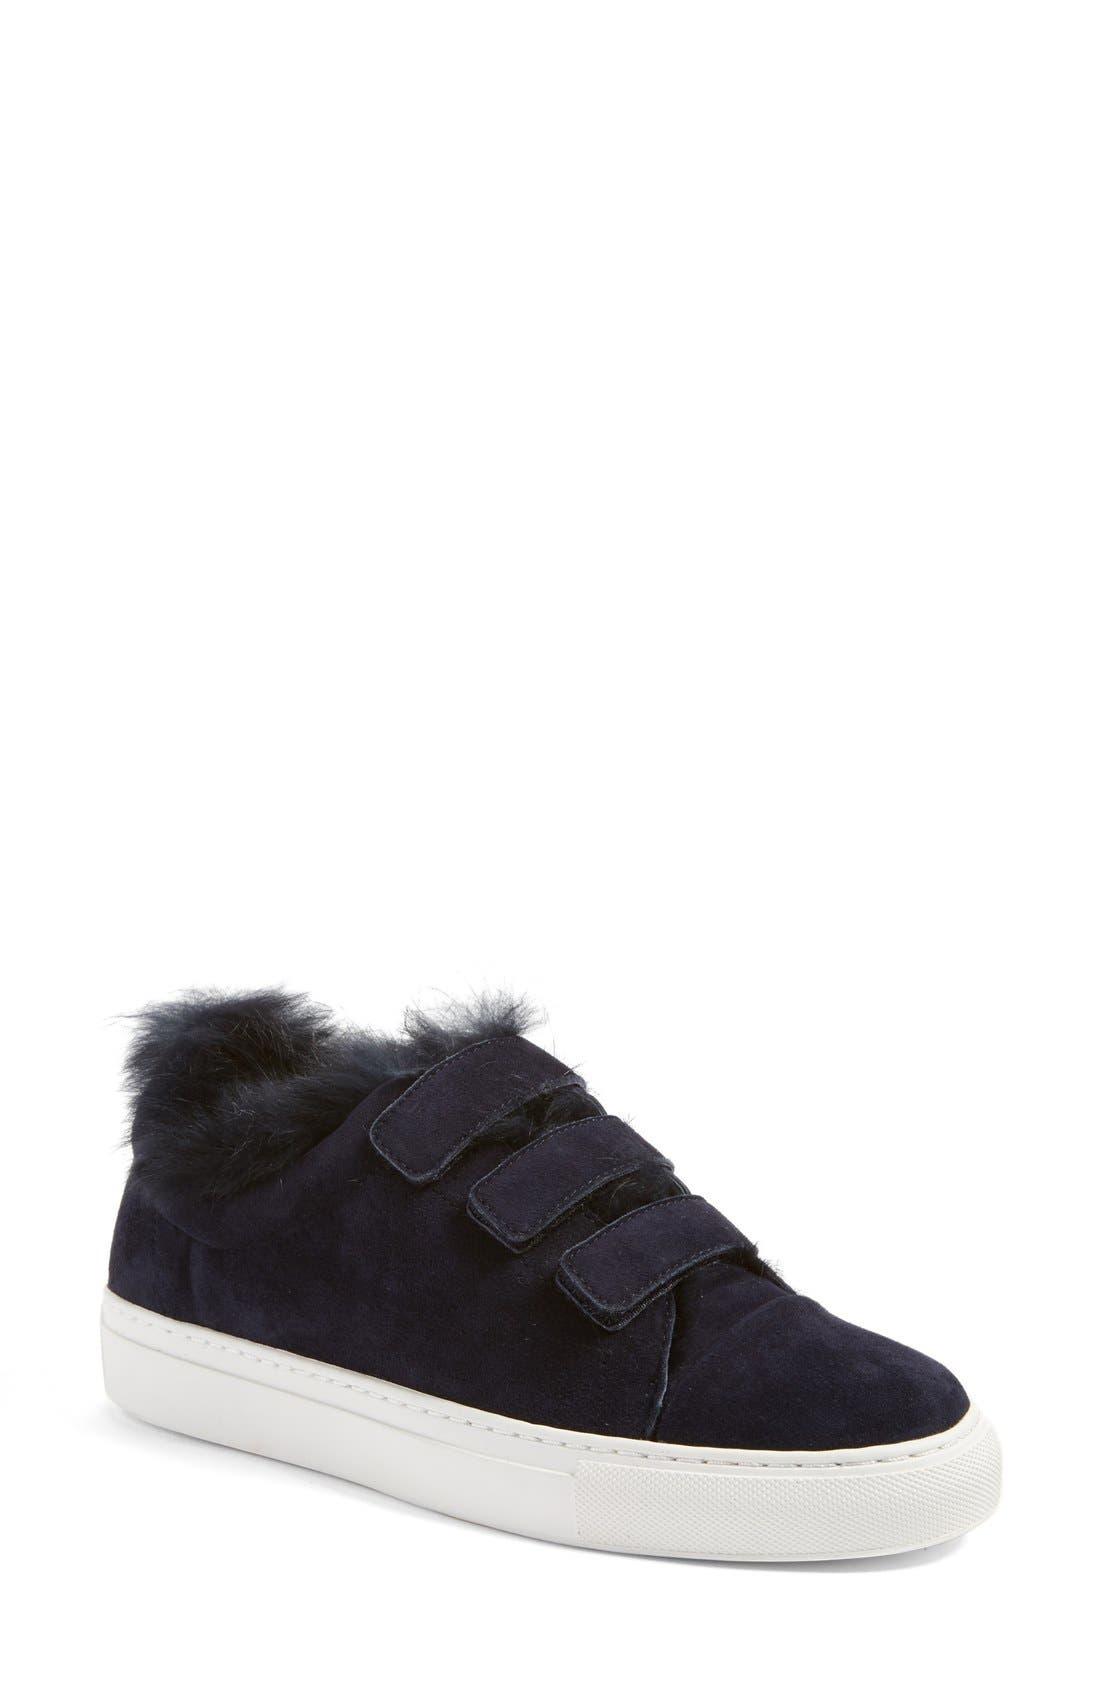 'Boe' Genuine Rabbit Fur & Shearling Lined Platform Sneaker,                             Main thumbnail 1, color,                             425